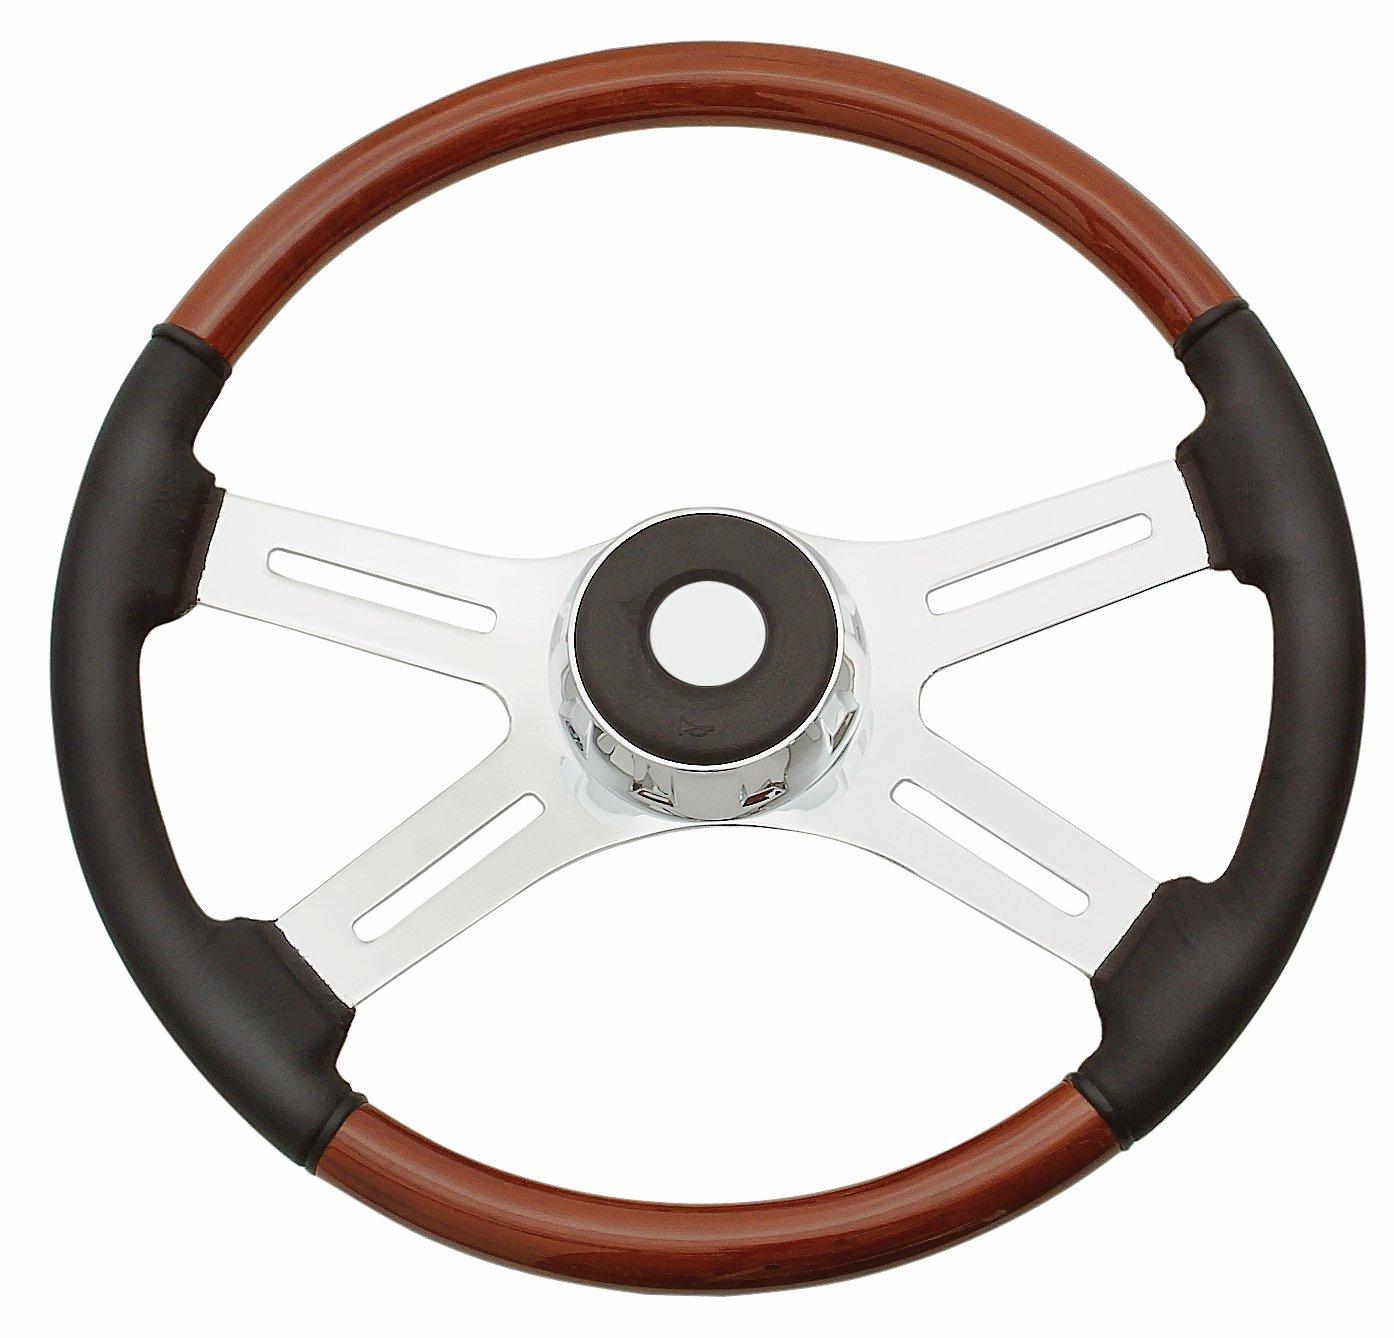 Woodys WP-SWPB7598L Rosewood Chrome Truck Steering Wheel Beautiful African Hardwood